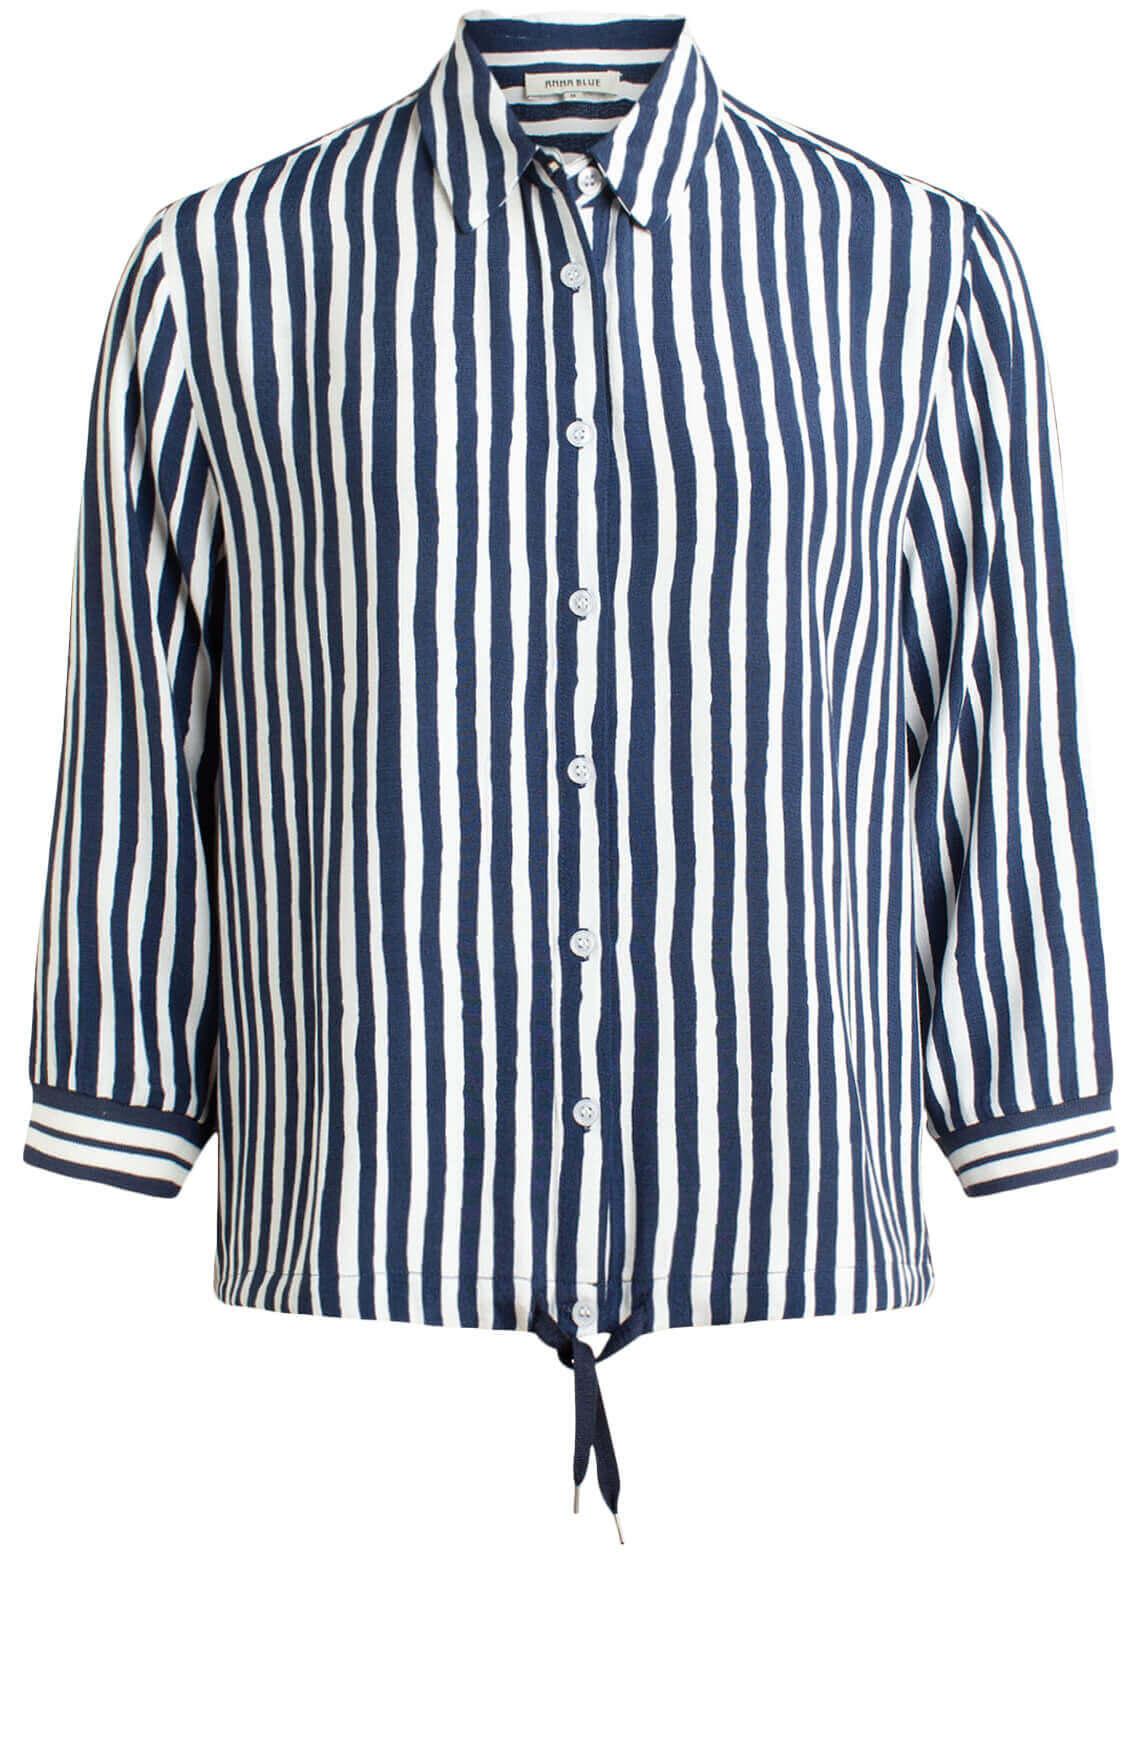 Anna Blue Dames Gestreepte blouse Blauw